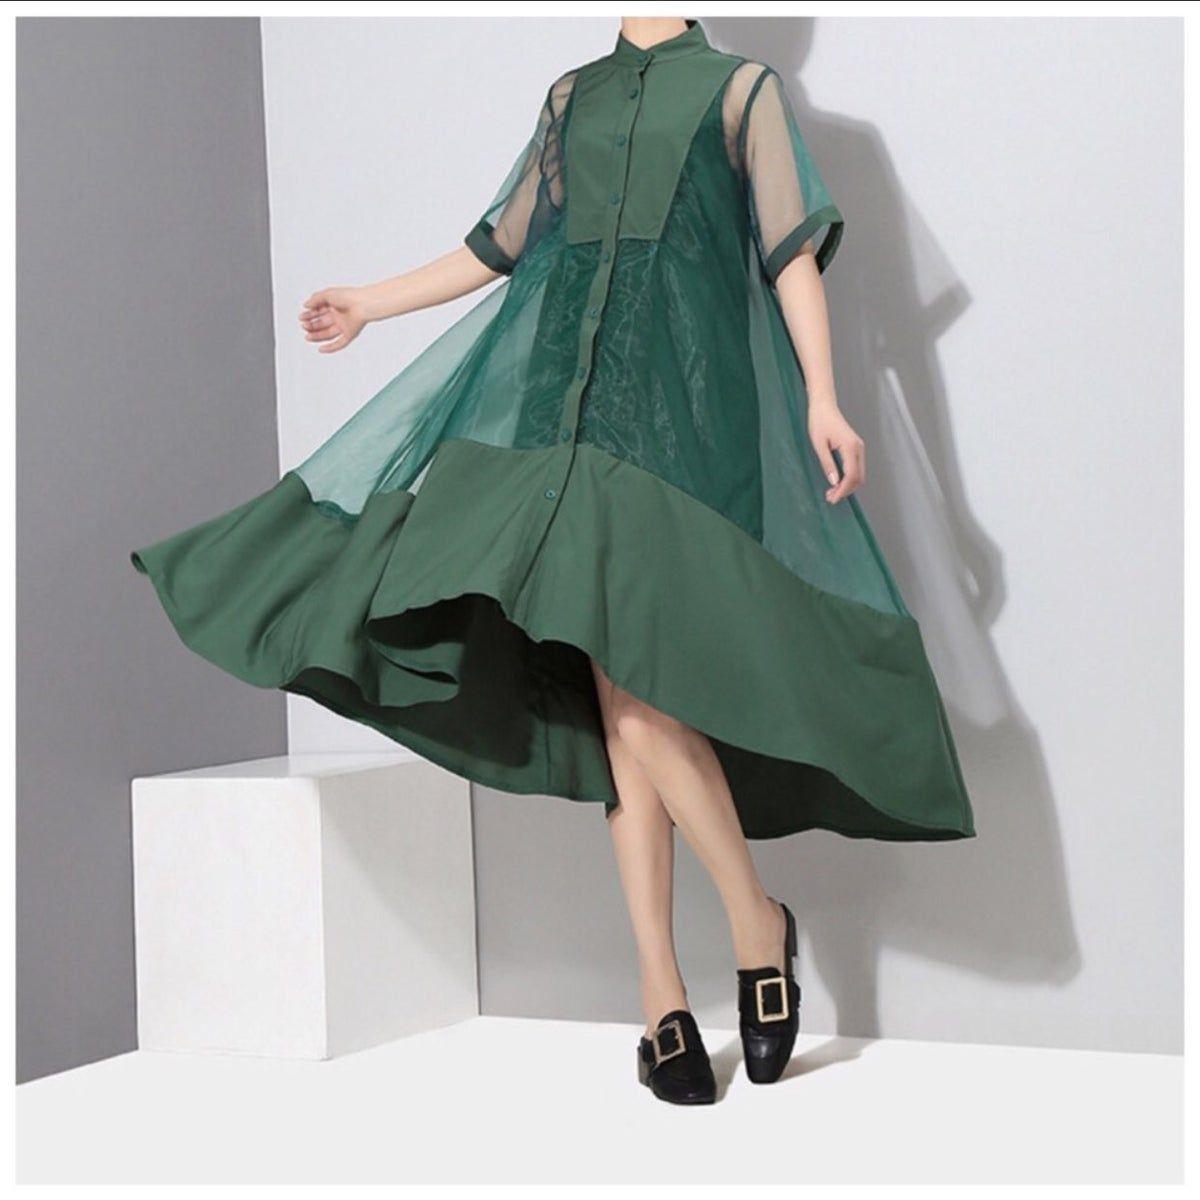 Green Sheer Asymmetrical Fun Swing Dress Stand Collar Dress Women Long Dresses Women S Fashion Dresses [ 1200 x 1200 Pixel ]